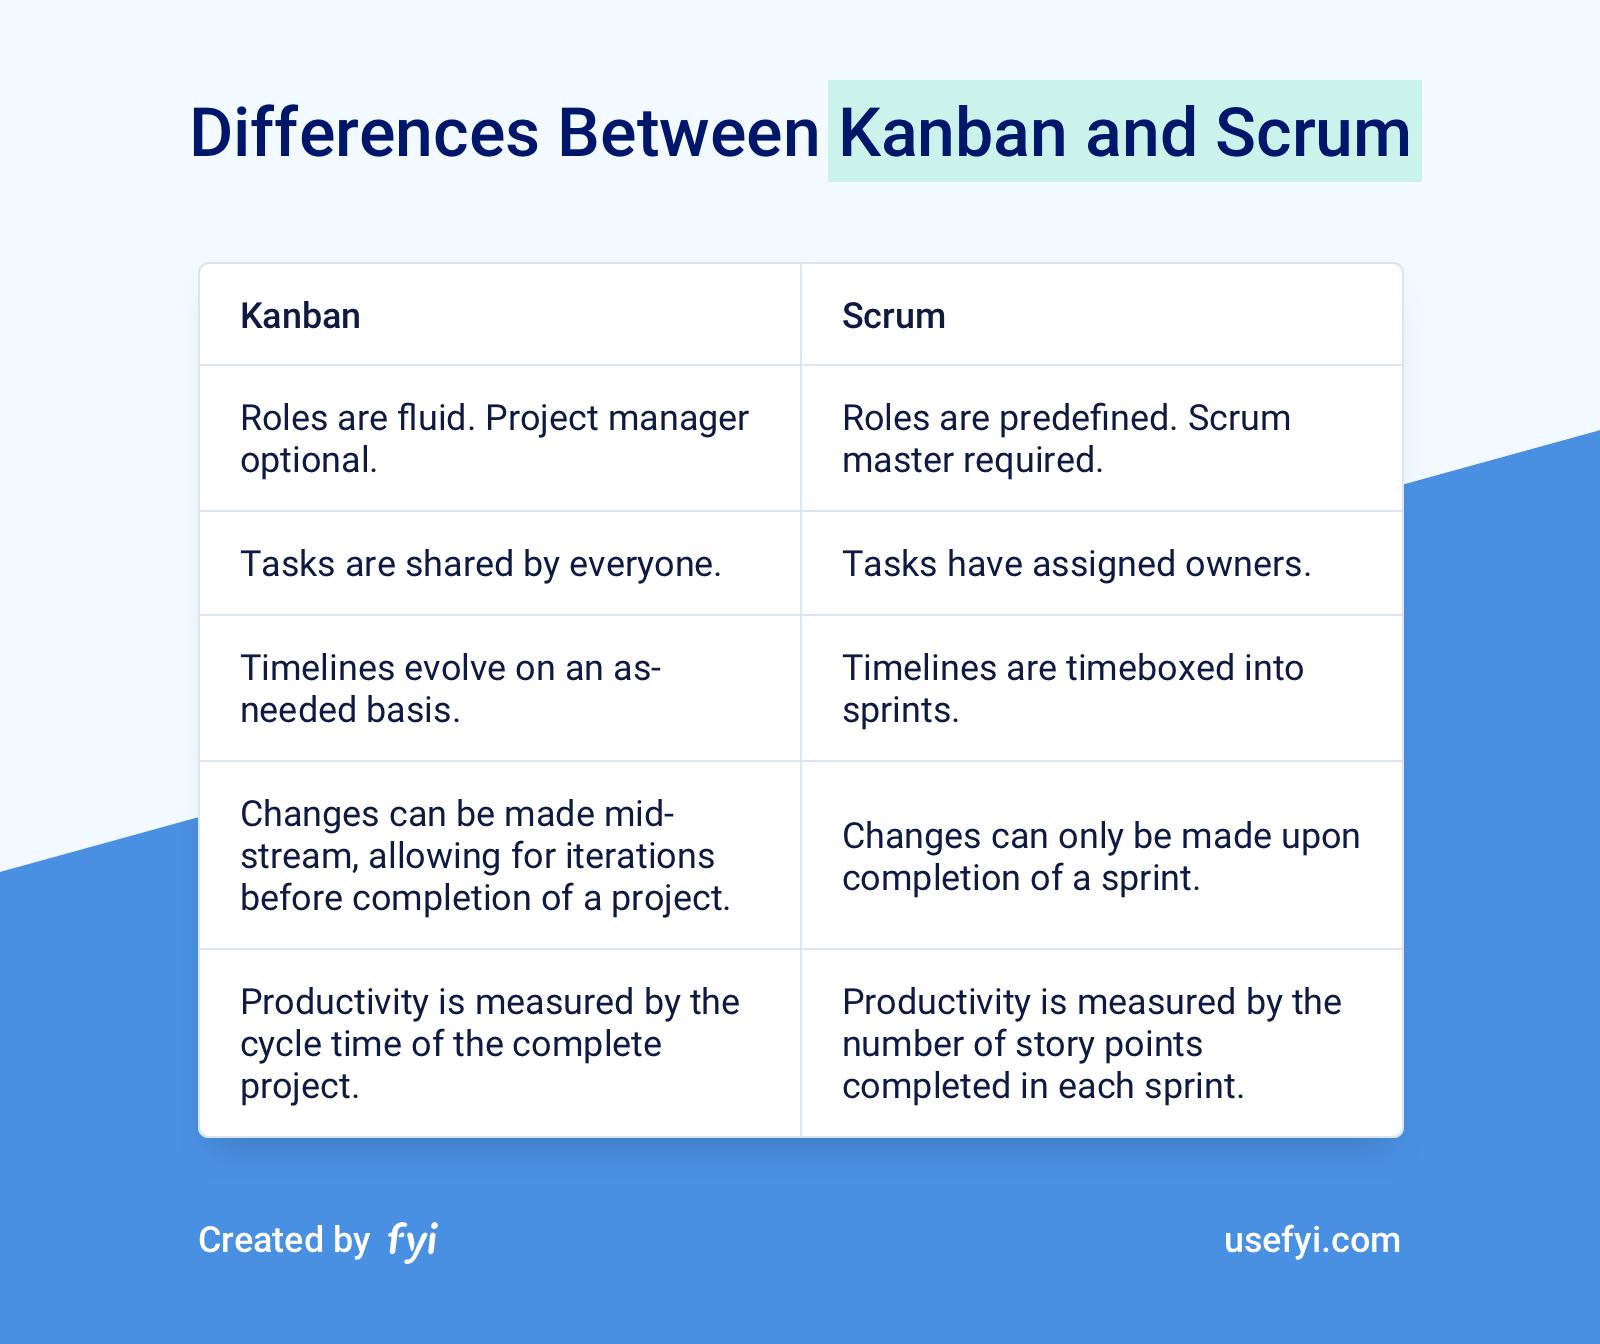 Kanban vs Scrum differences